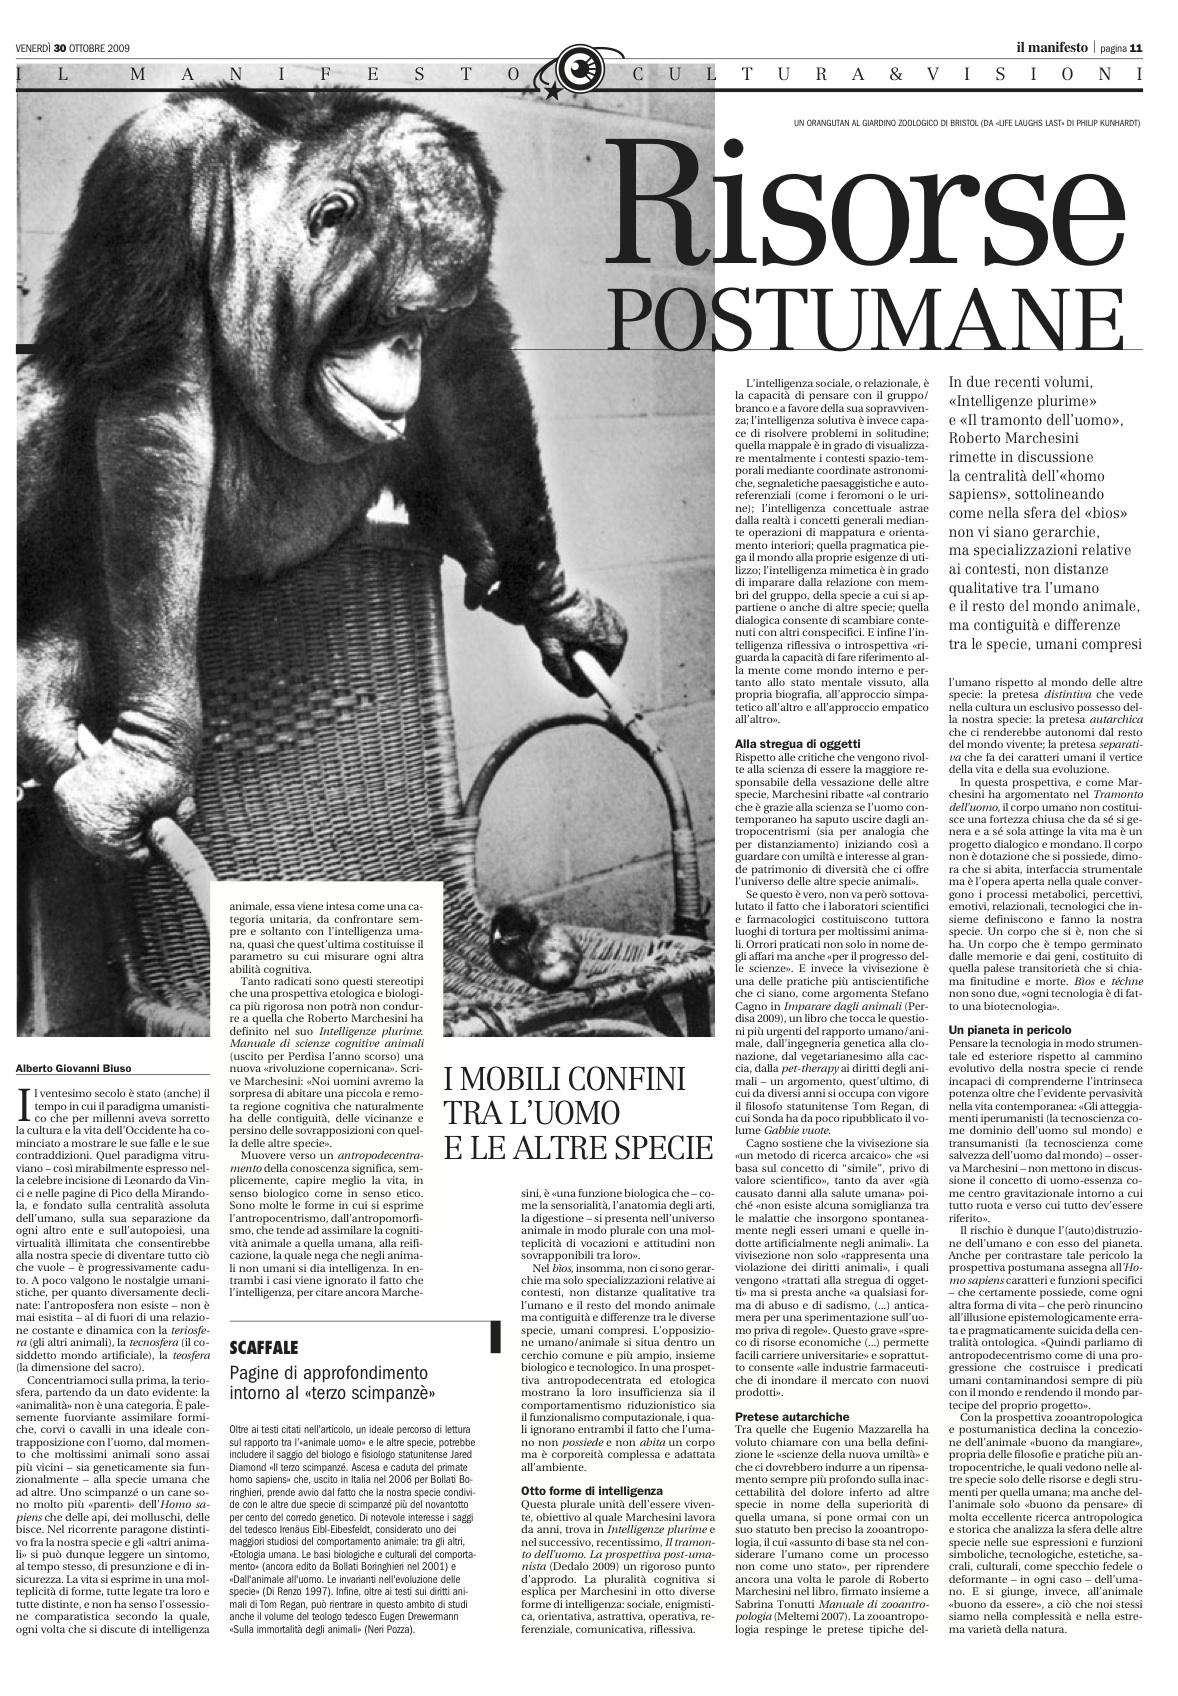 manifesto_postumano_30_10_09